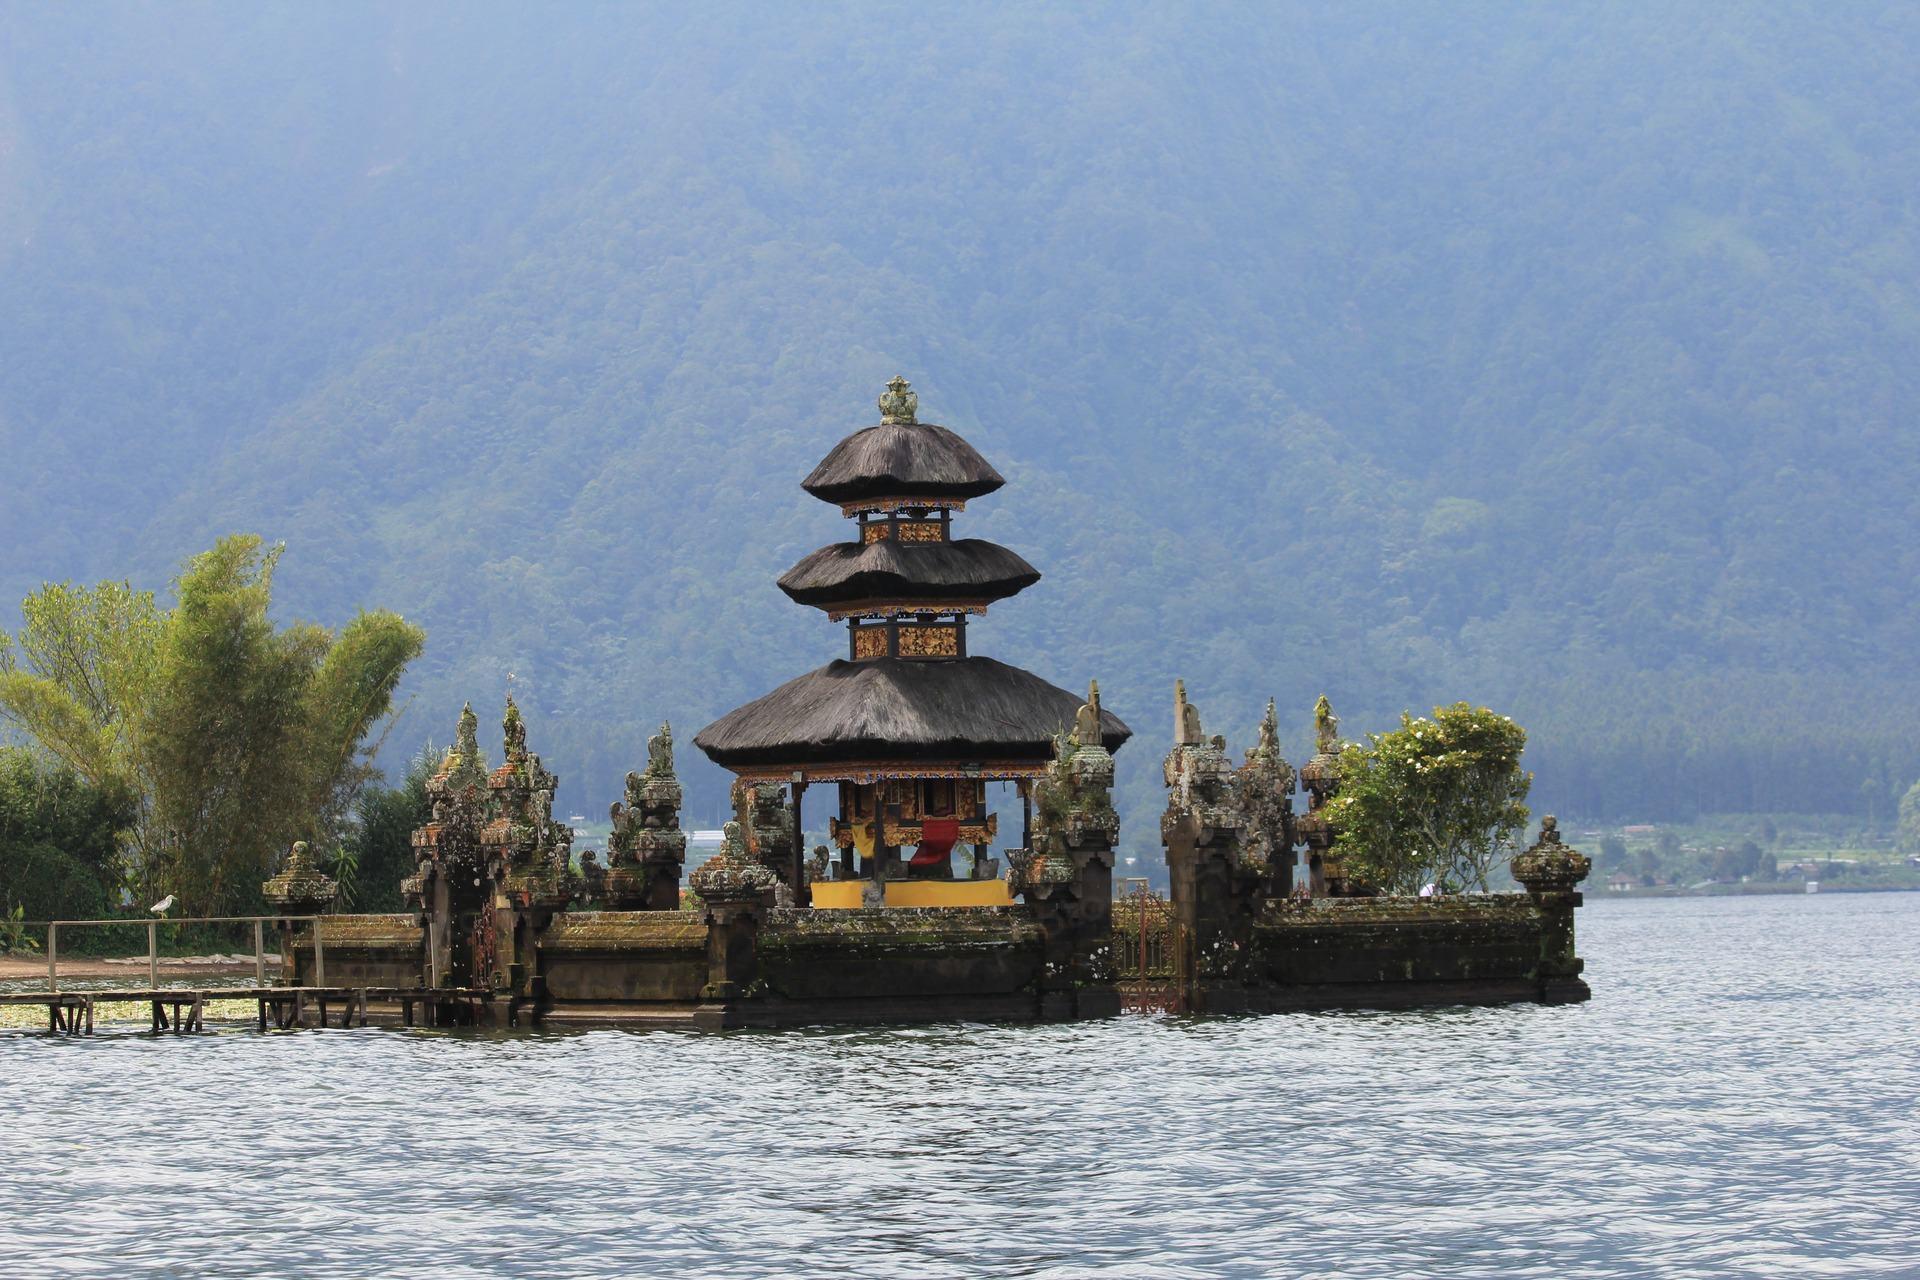 Temple on the lake, Bali (Indonesia).